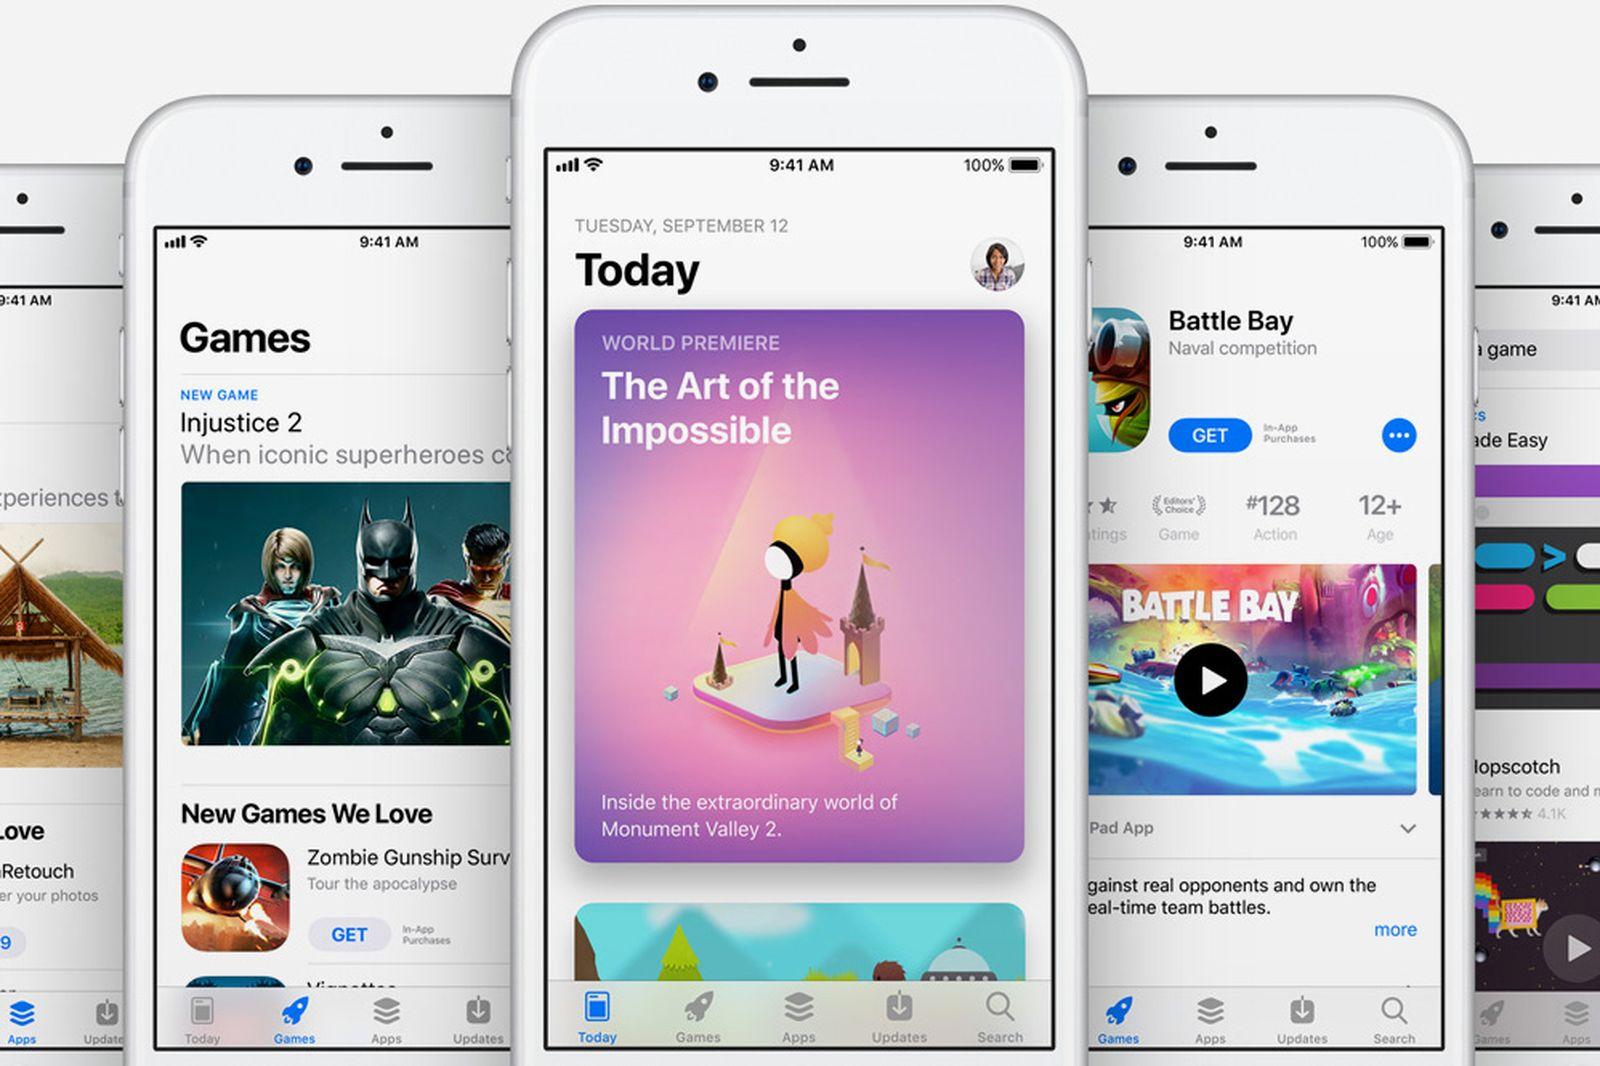 apple-apps-location-data-sharing-001